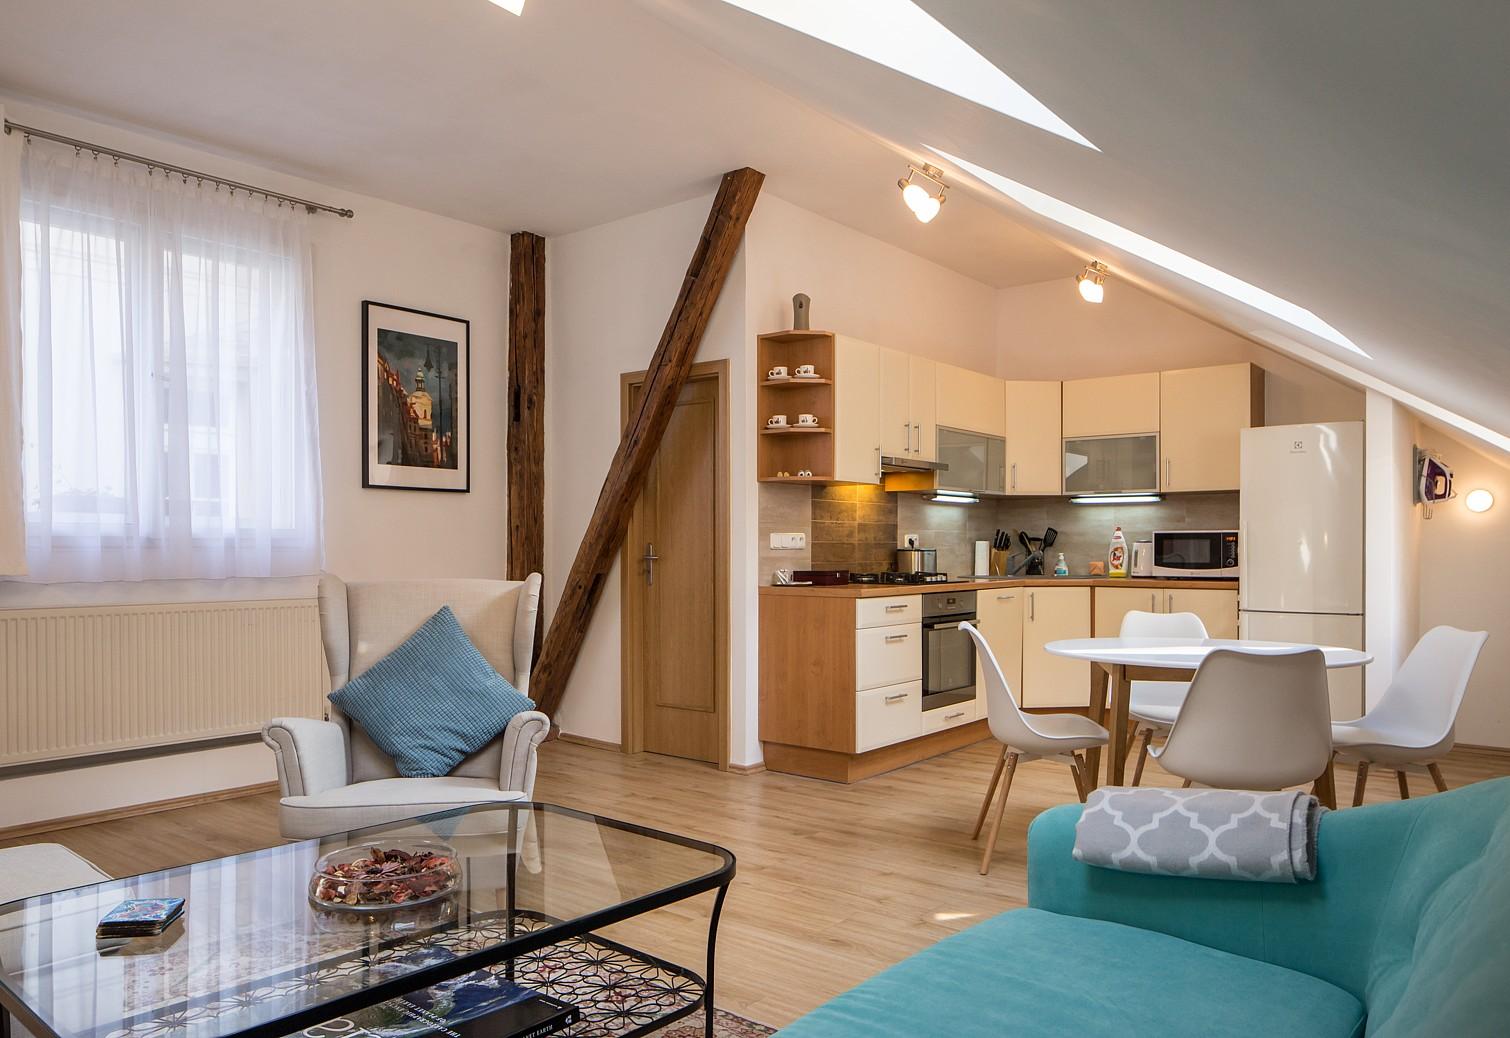 Superb Gorgeous Fully Furnished Apartment In Prague 1. U003e